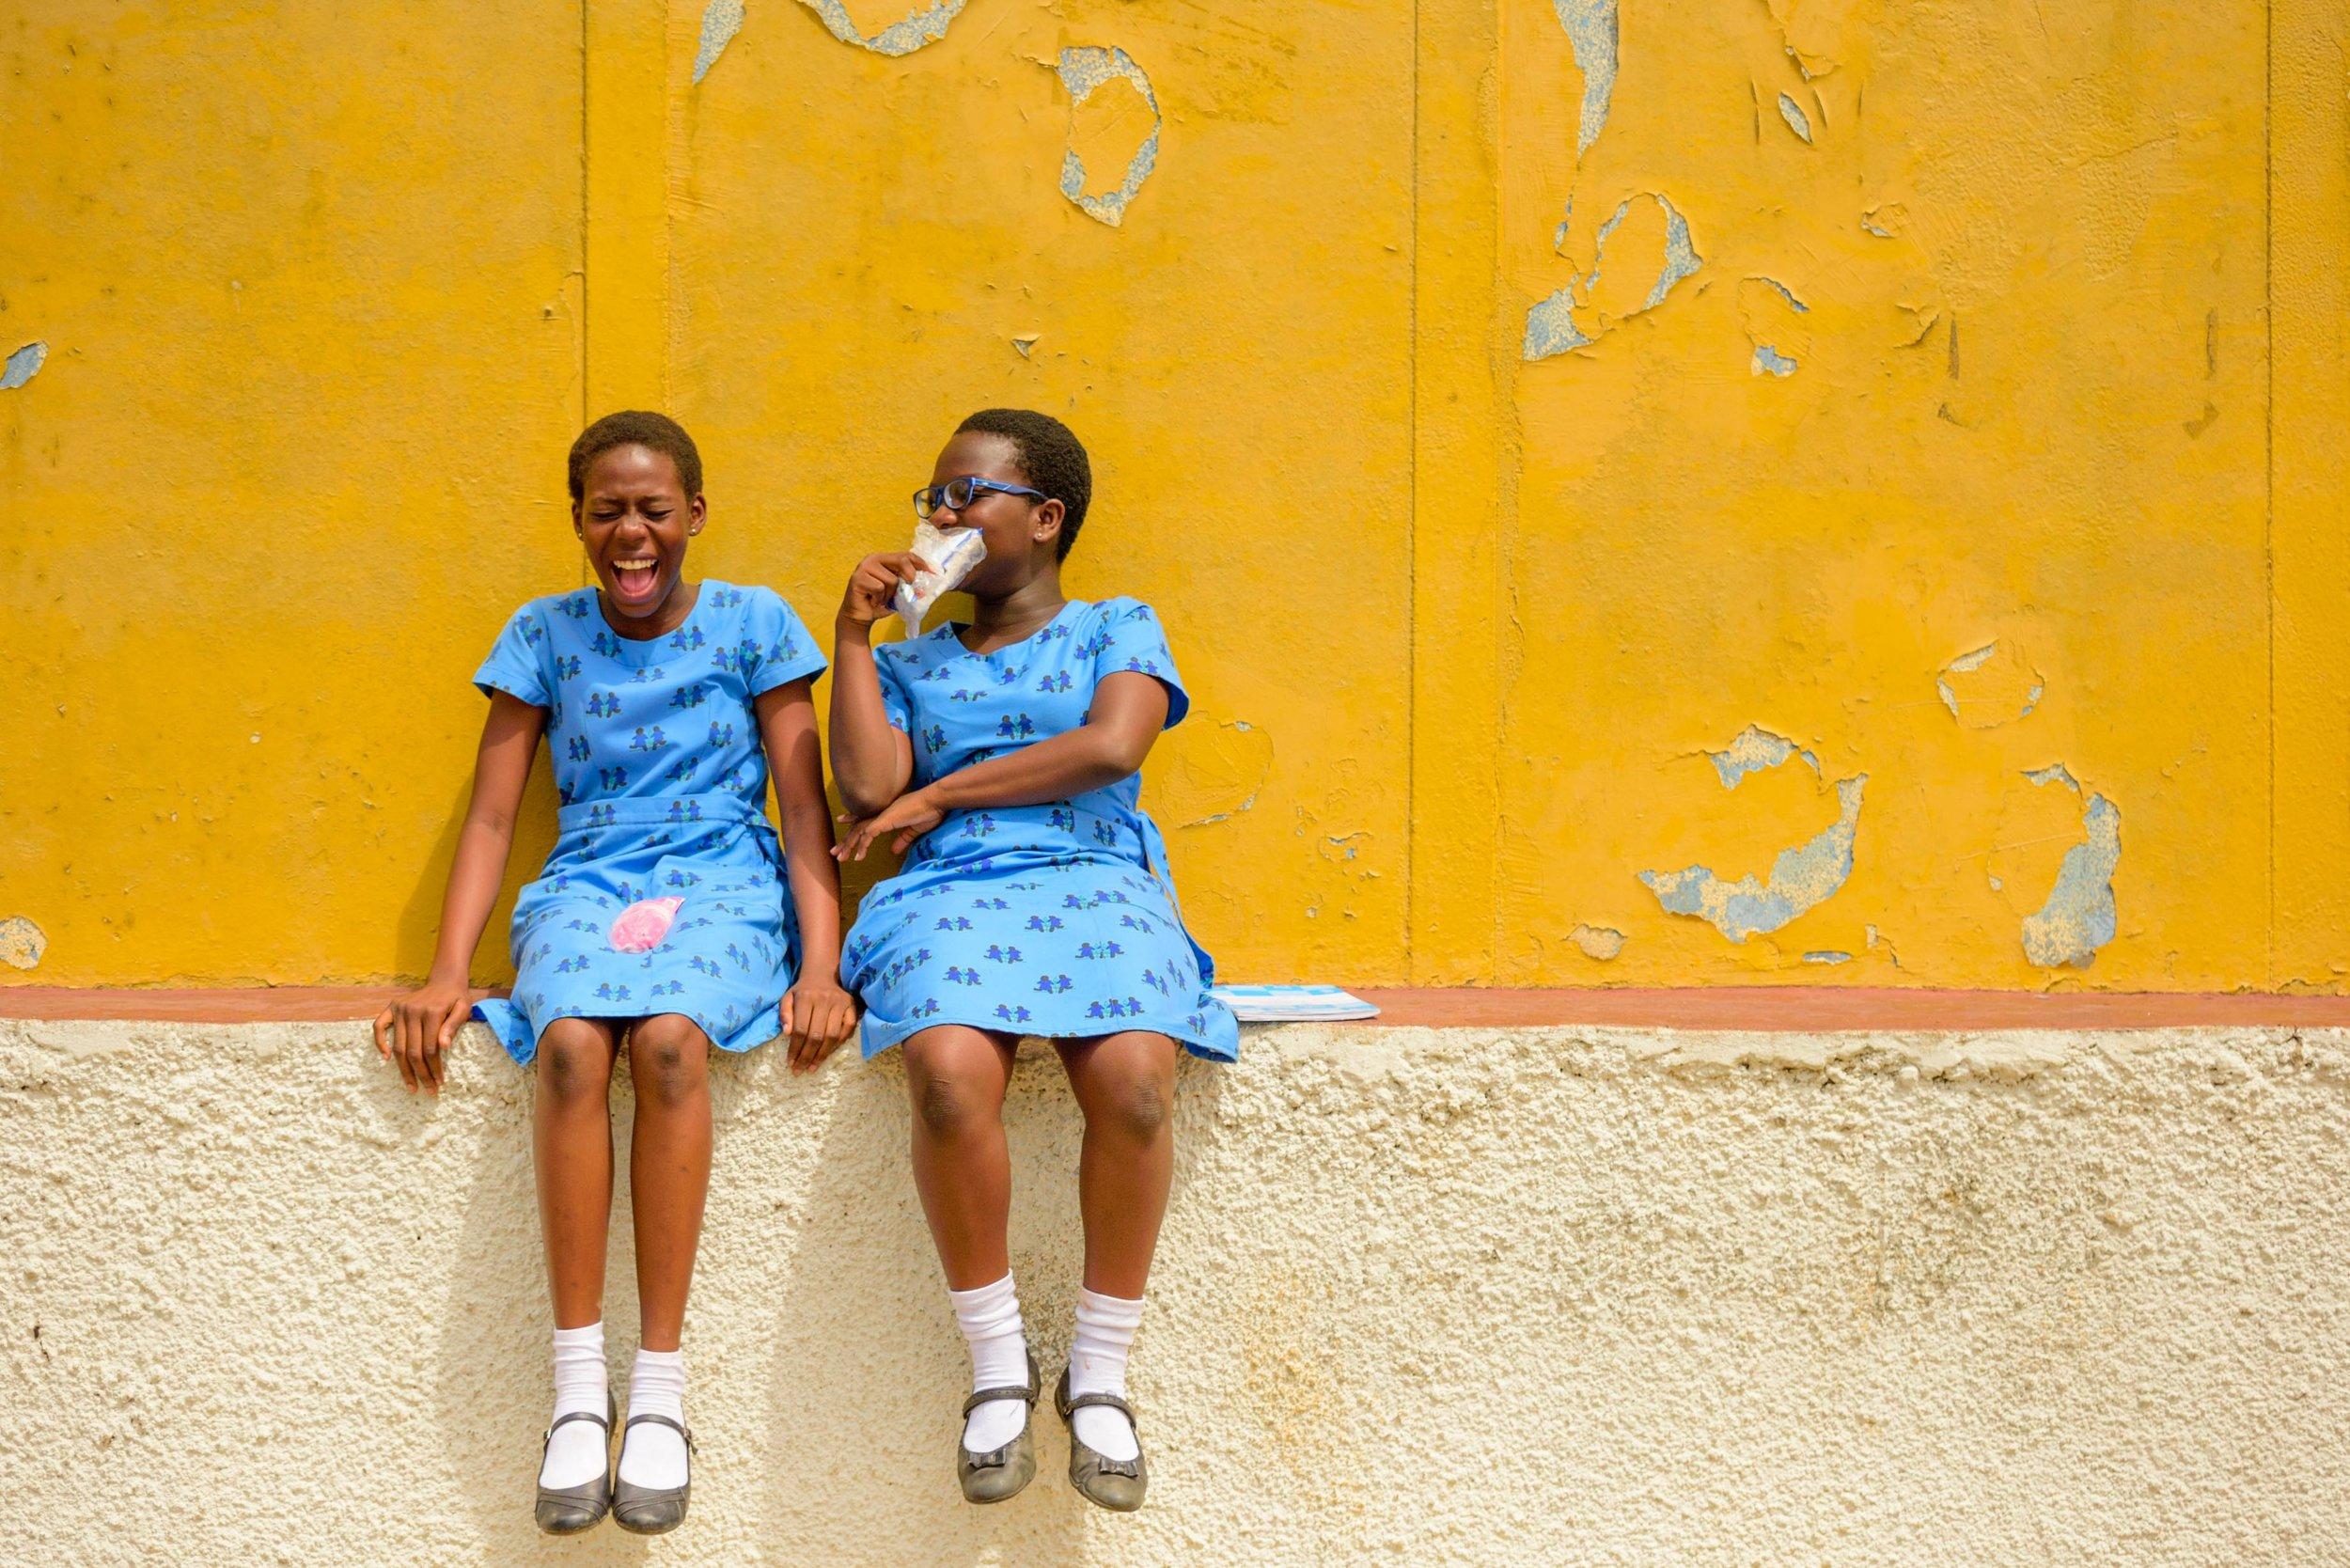 Ghana, SOS Children's Villages (SOS Kinderdorpen)